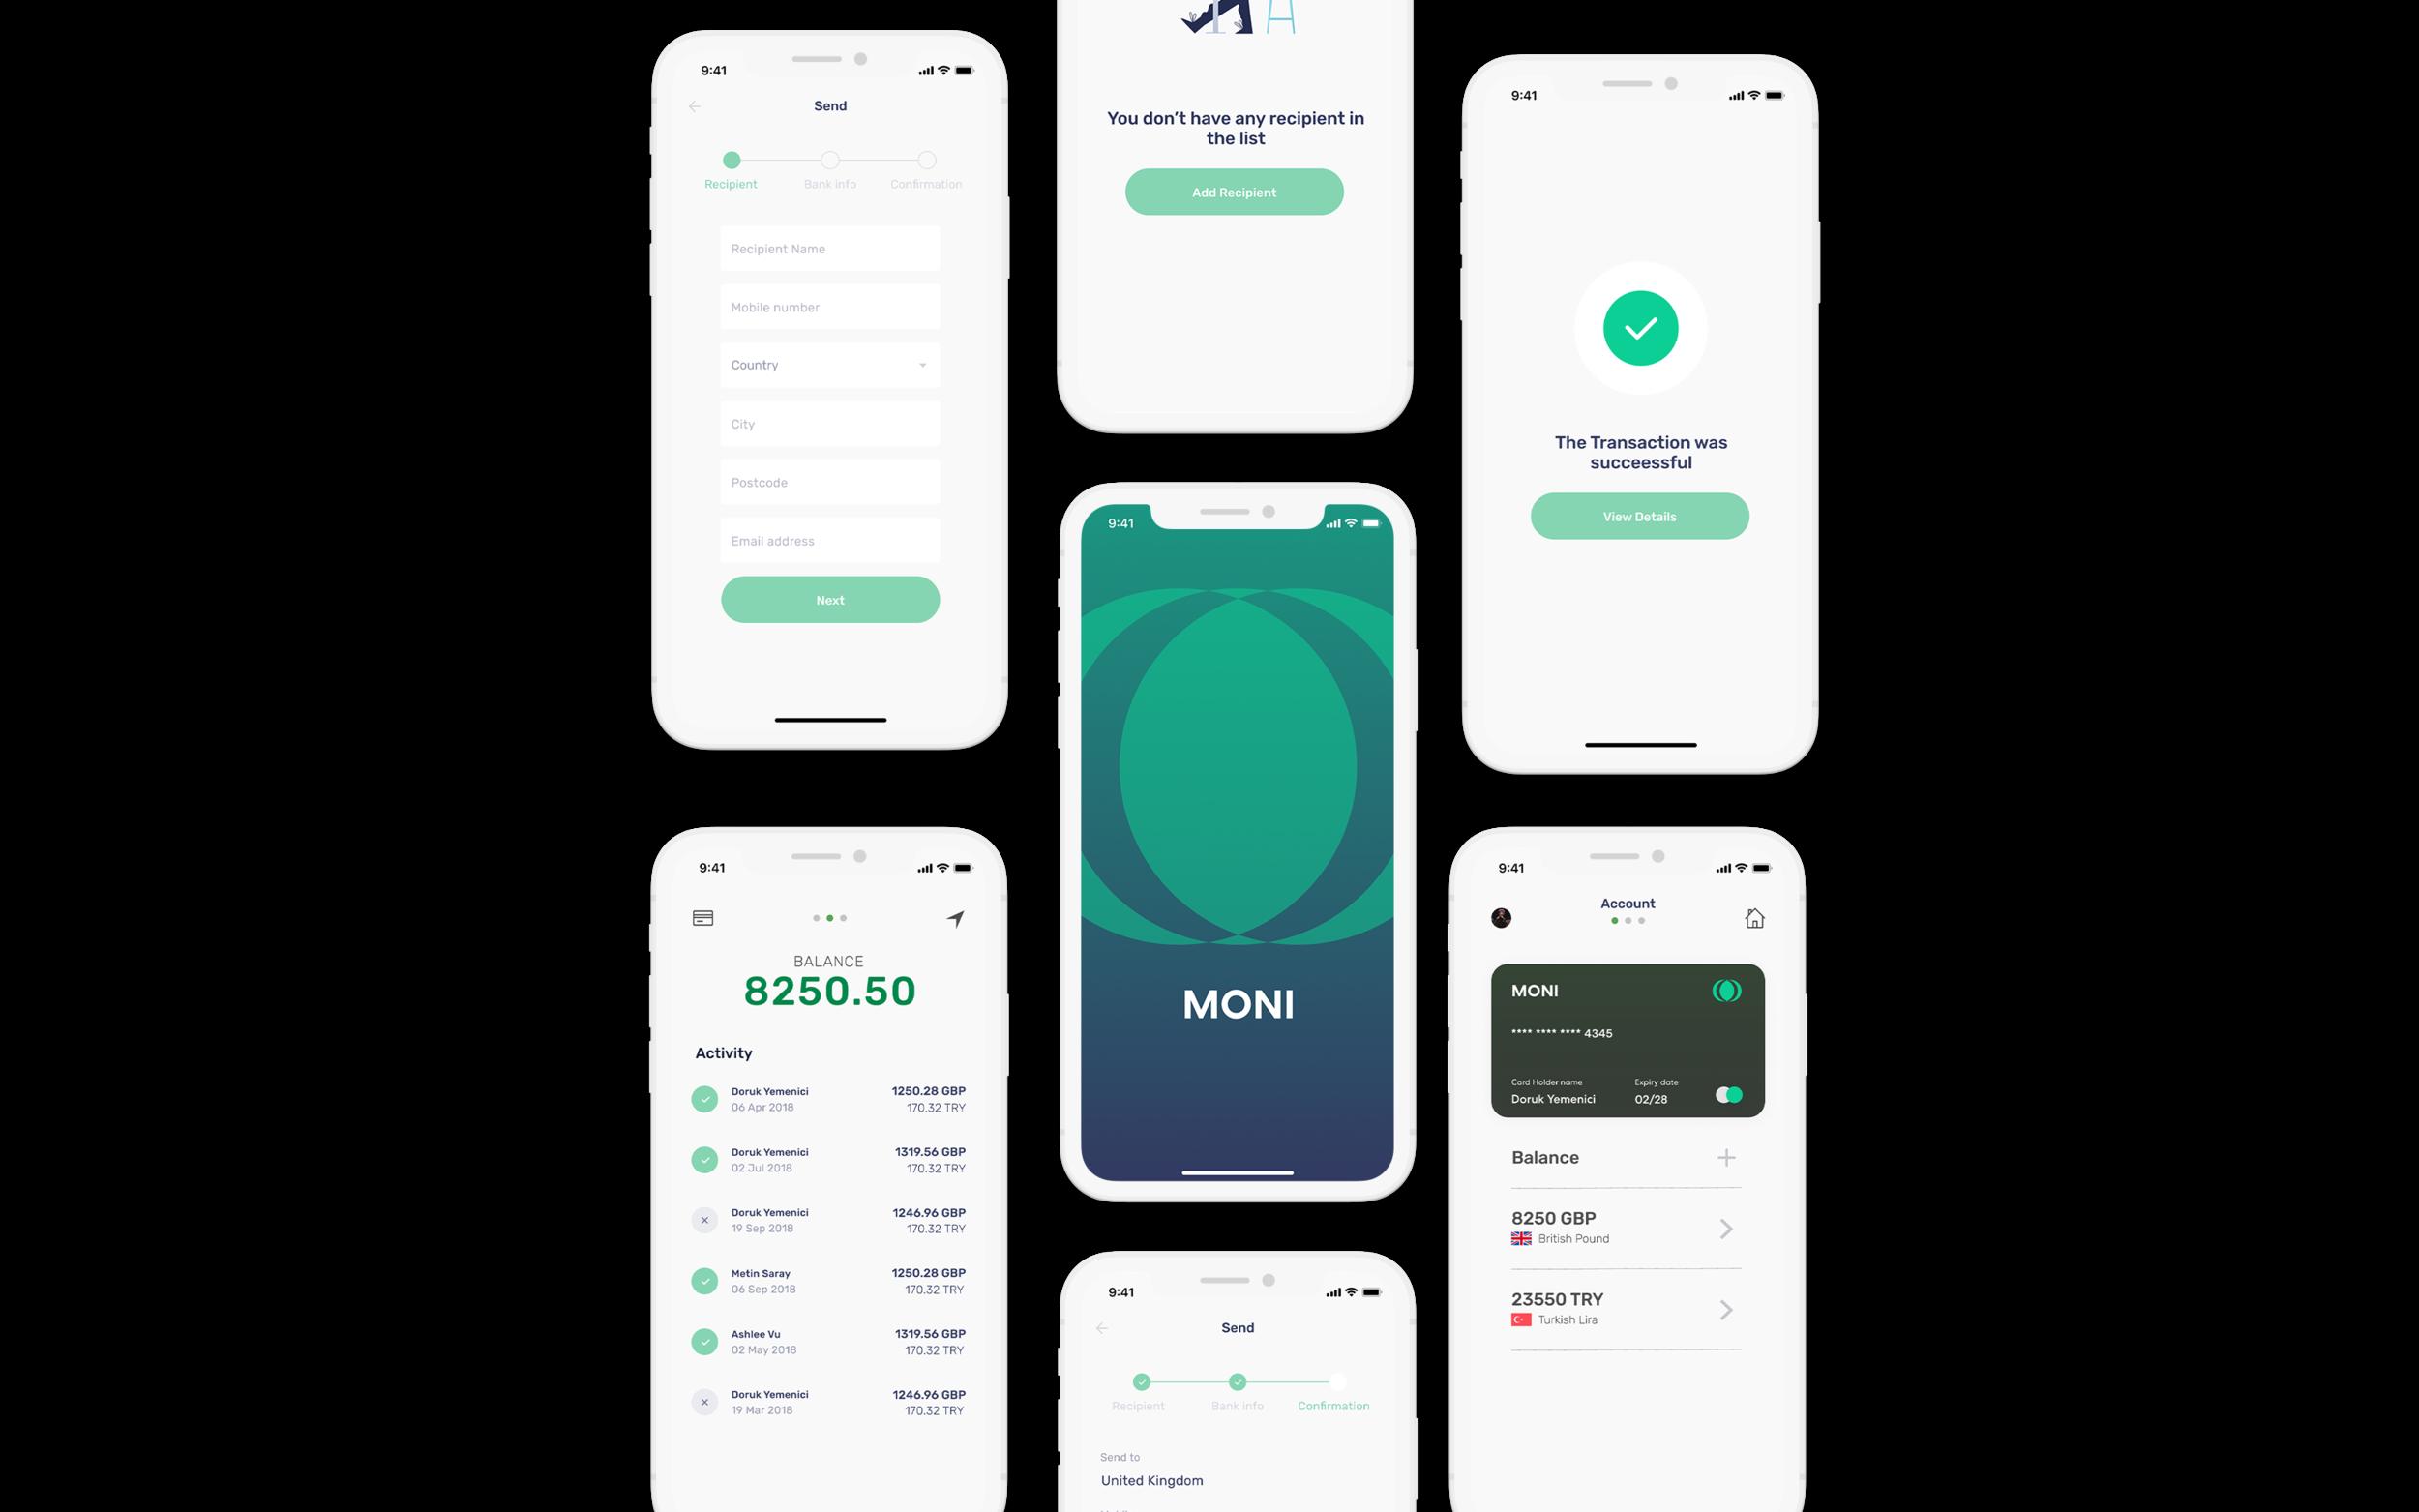 MONI - Money TRANSFER - Money Transfer application - Product Design - Work in Progress